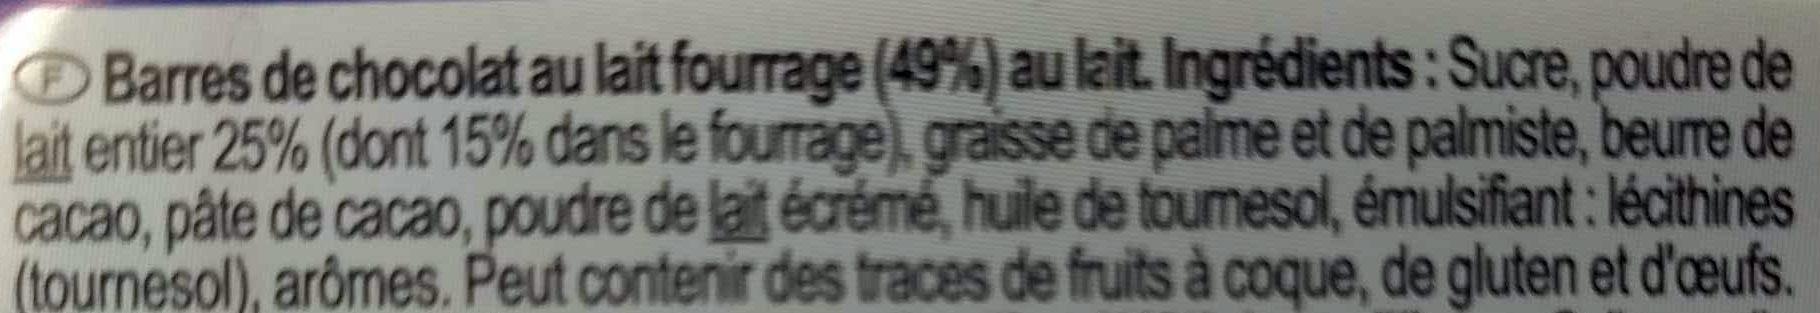 Mini barres Chocolat au lait - Ingredientes - fr